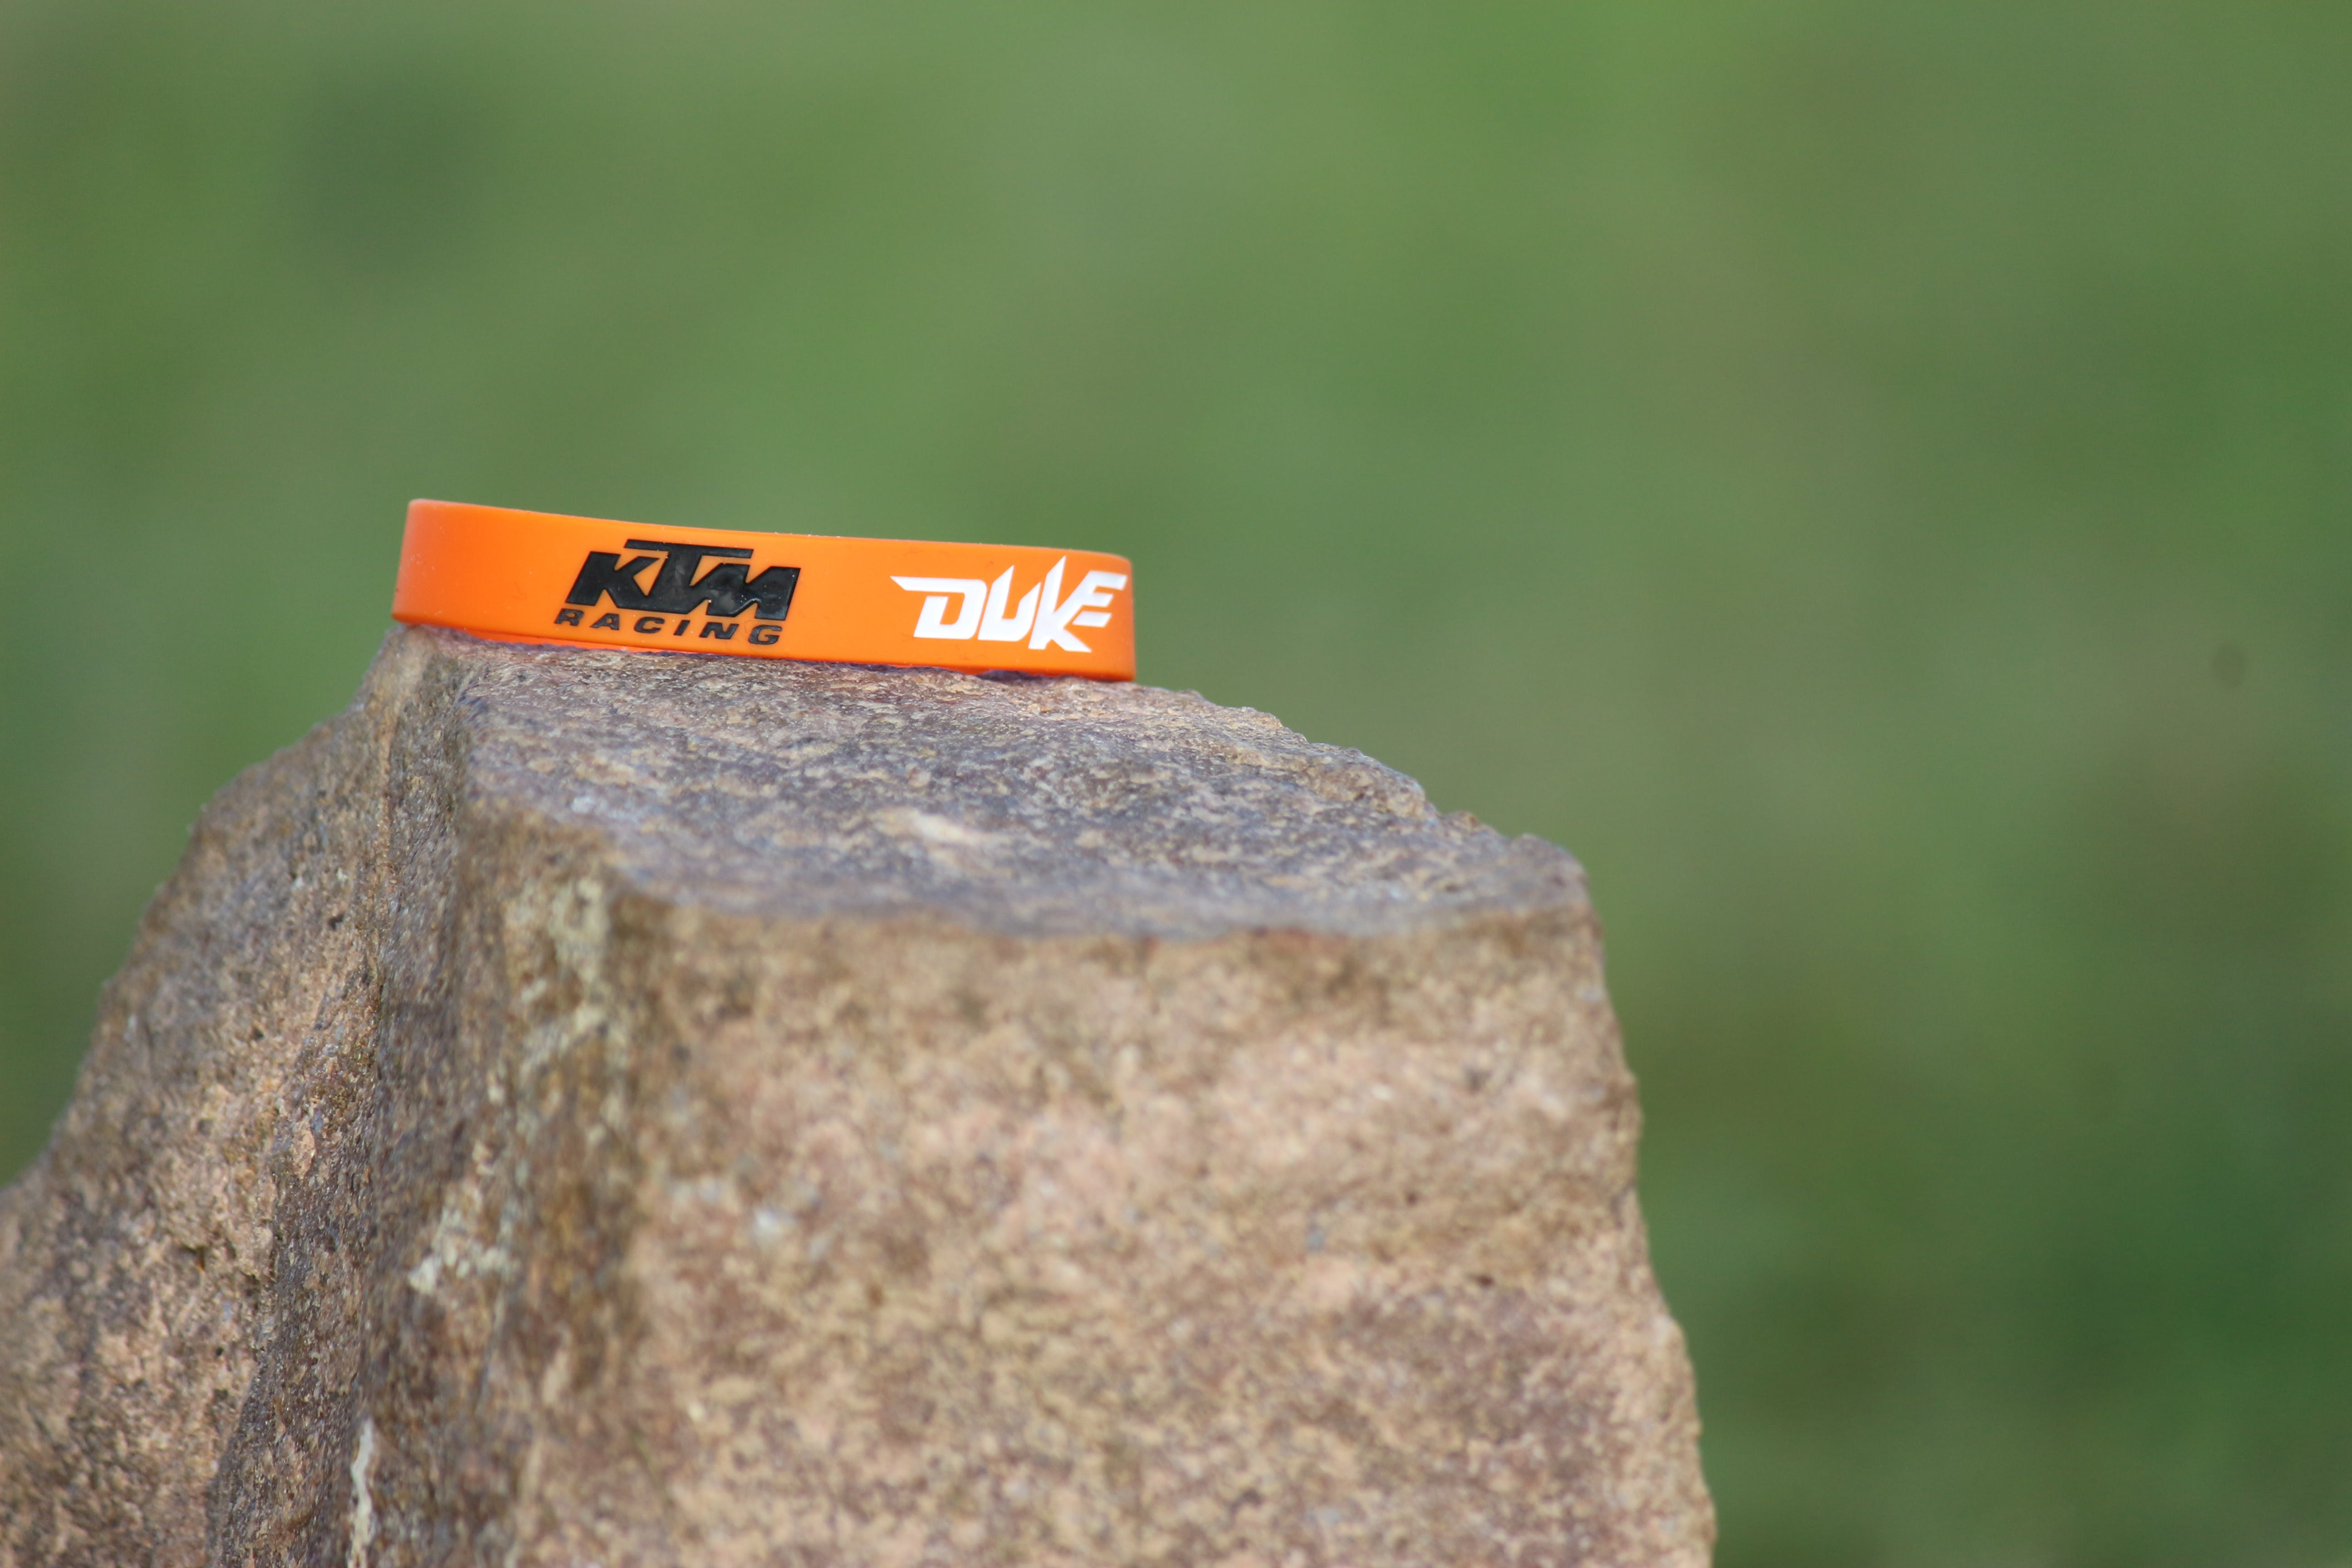 Free stock photo of KTM duke